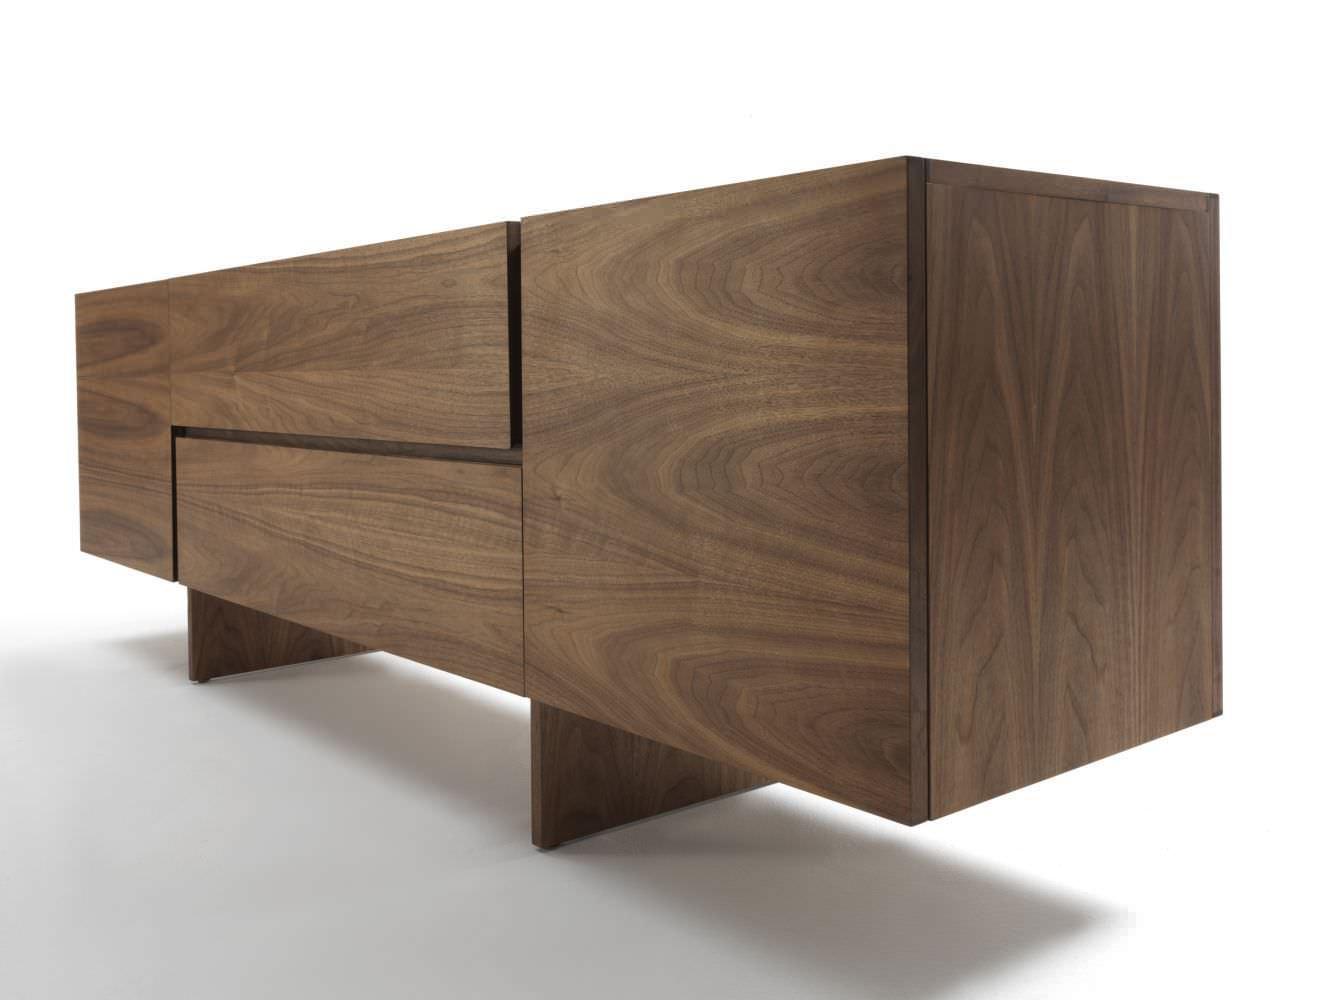 Sideboard design modern  Modernes Sideboard / Massivholz - AKI by Bartoli Design - Riva ...